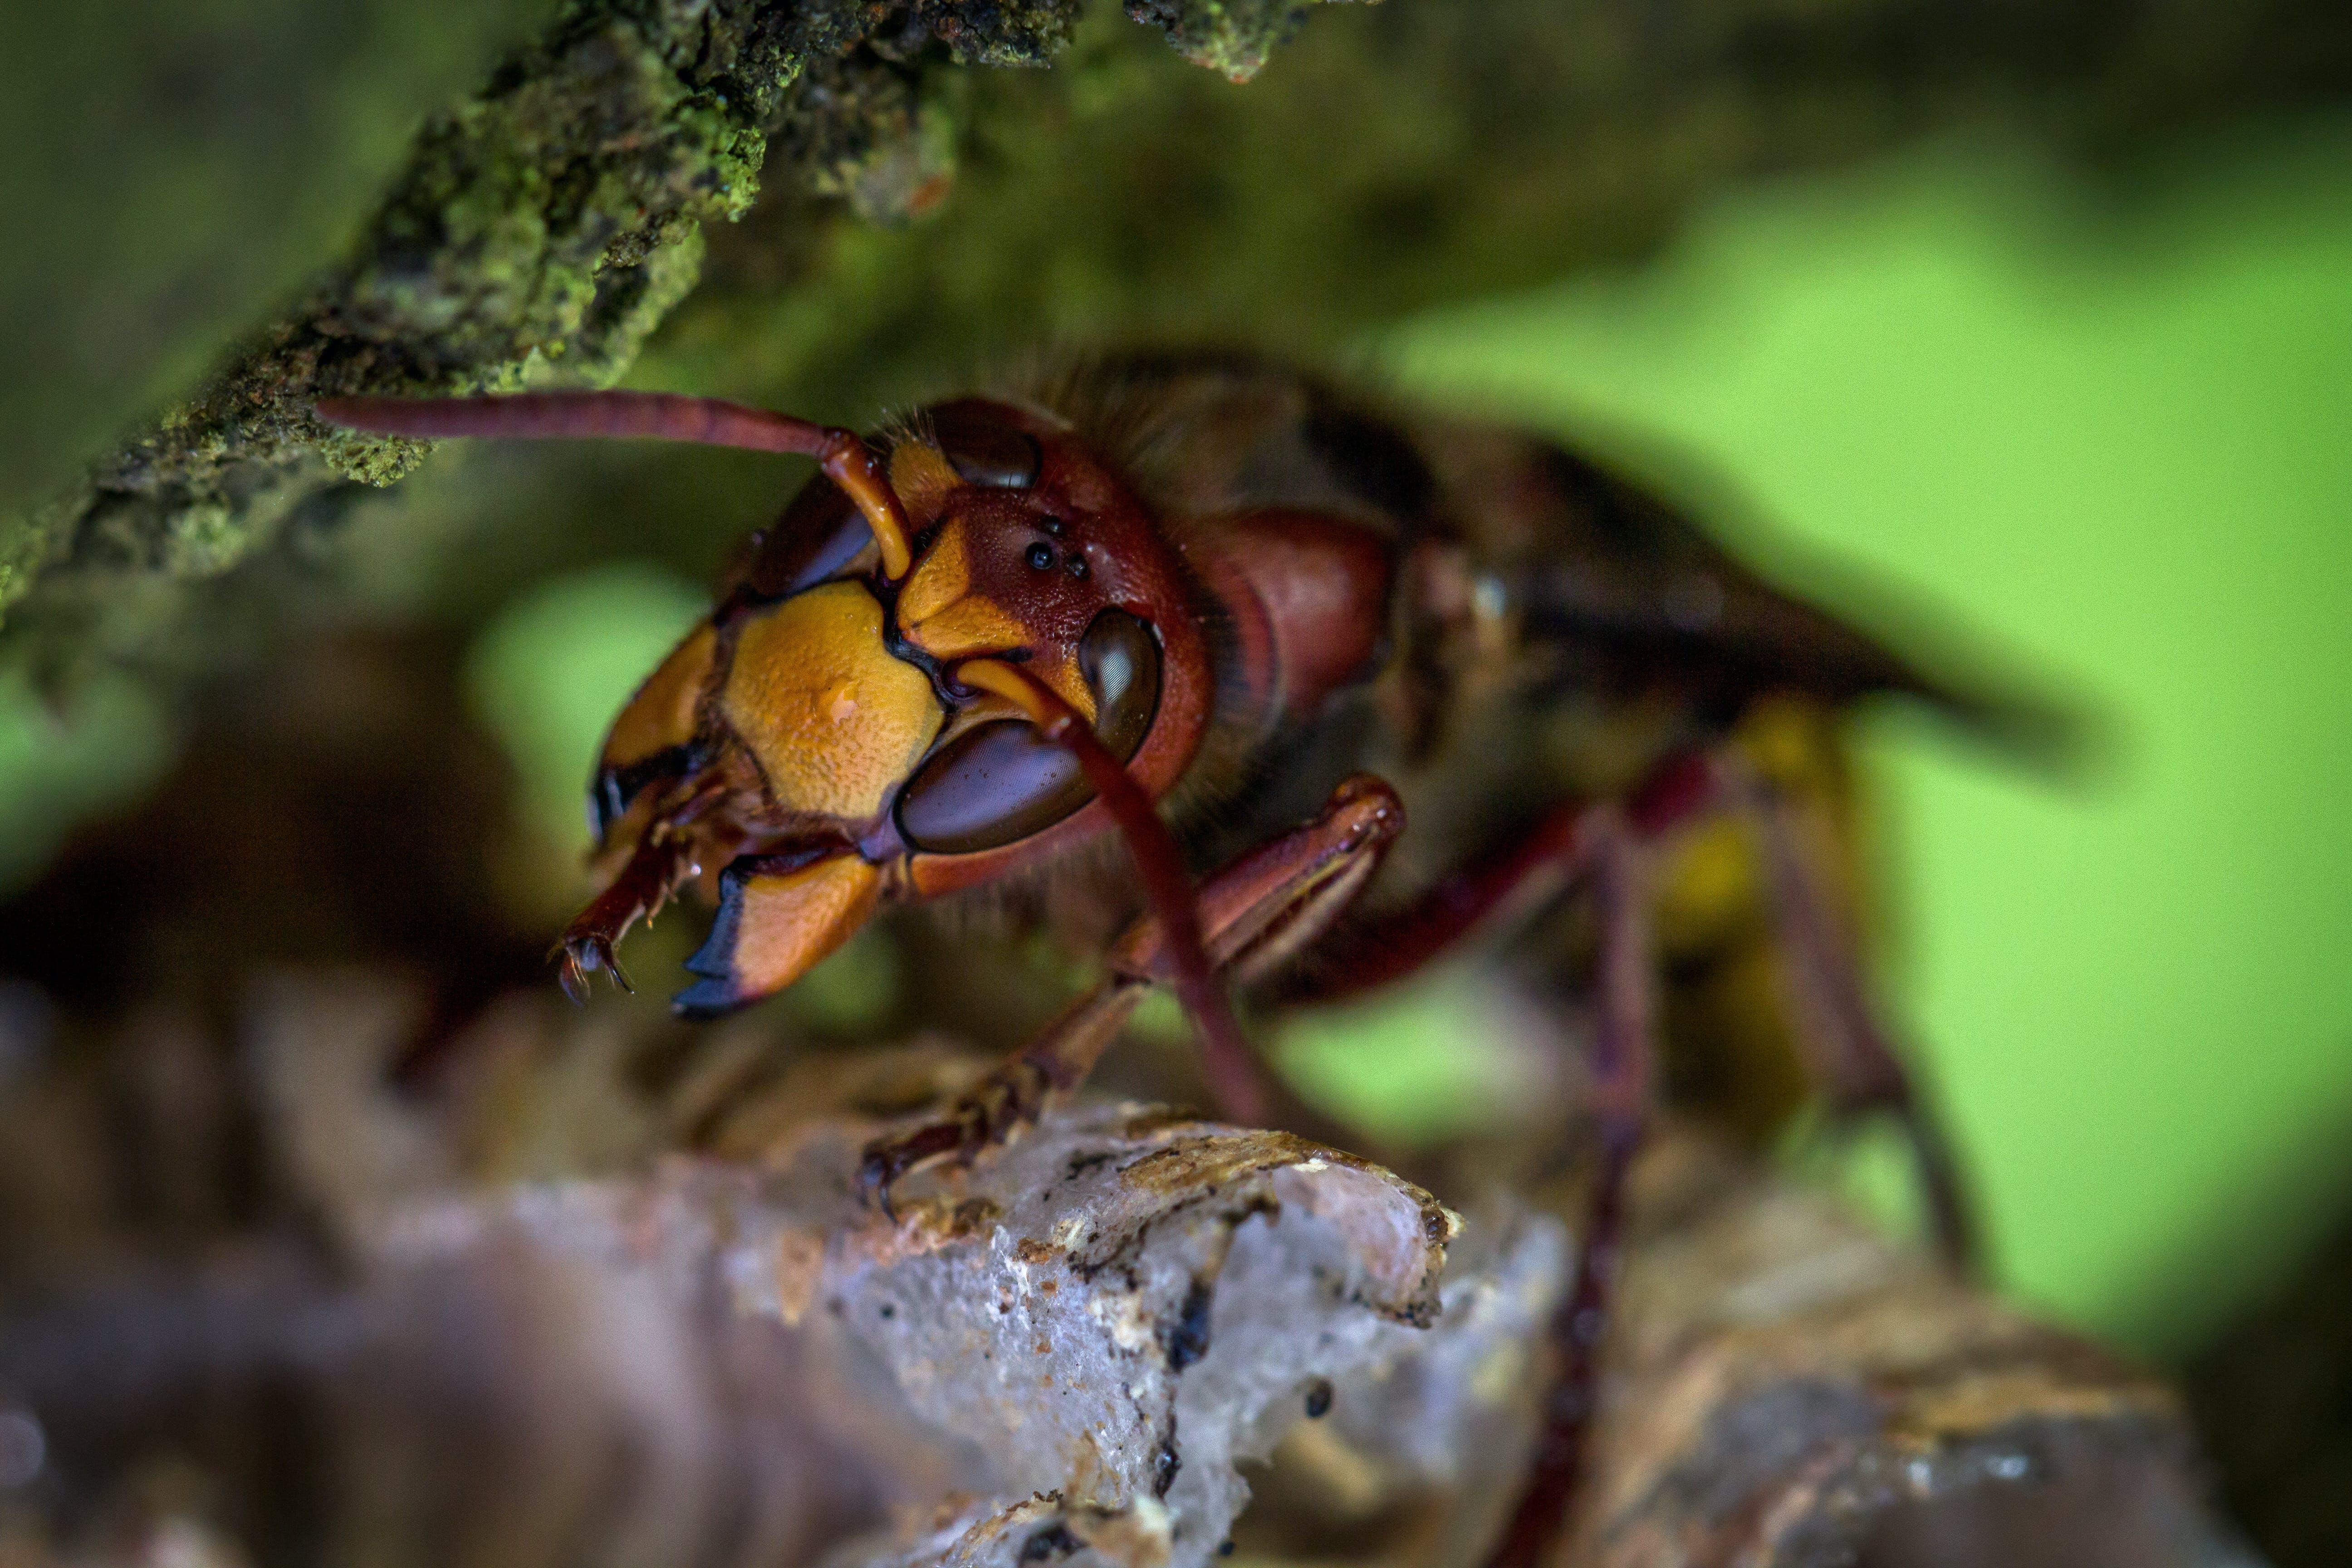 Hornet Macro Photography